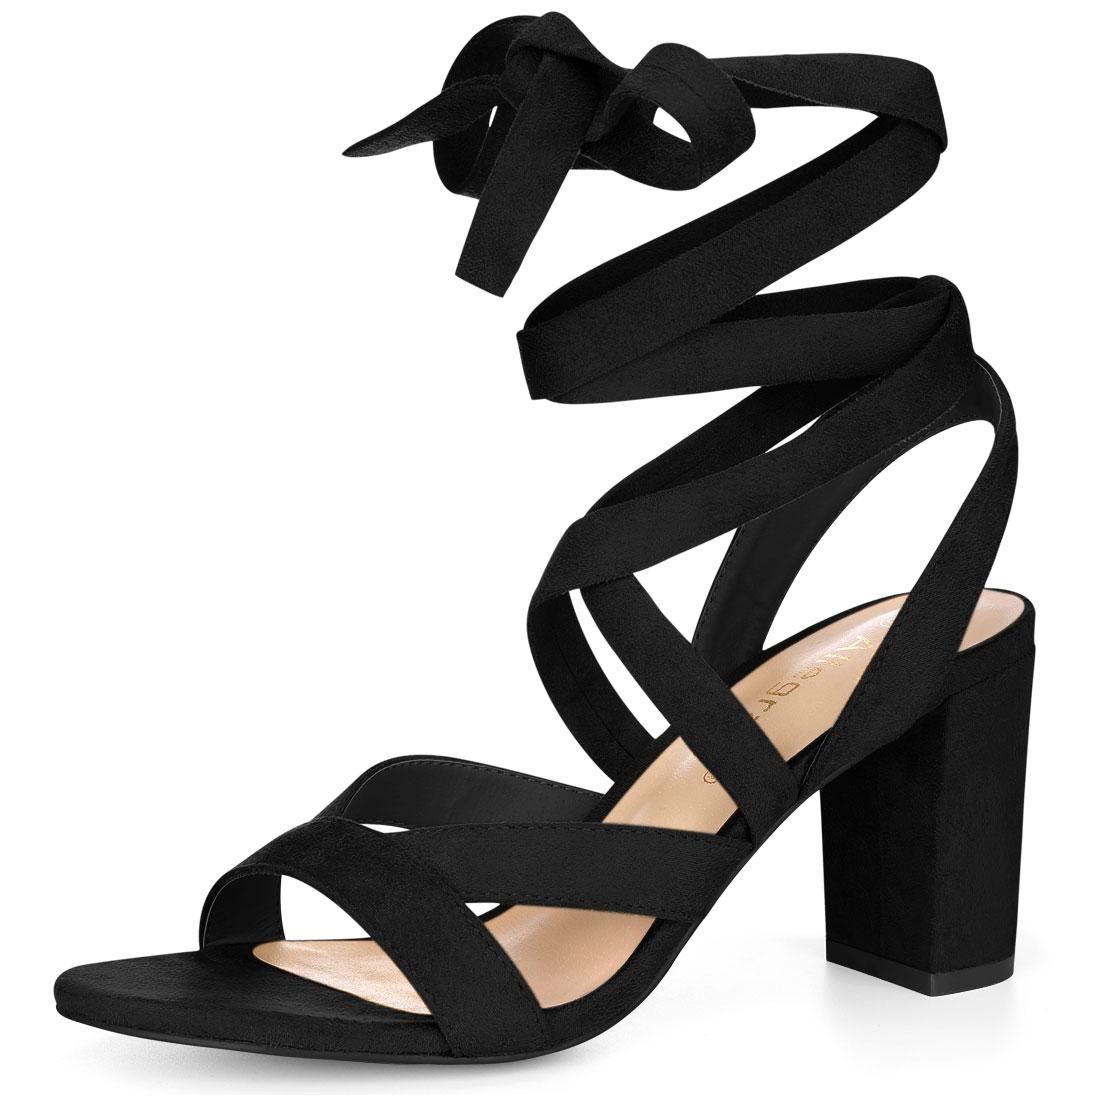 Allegra K Women Crisscross Lace Up Chunky Heel Sandals Black US 9